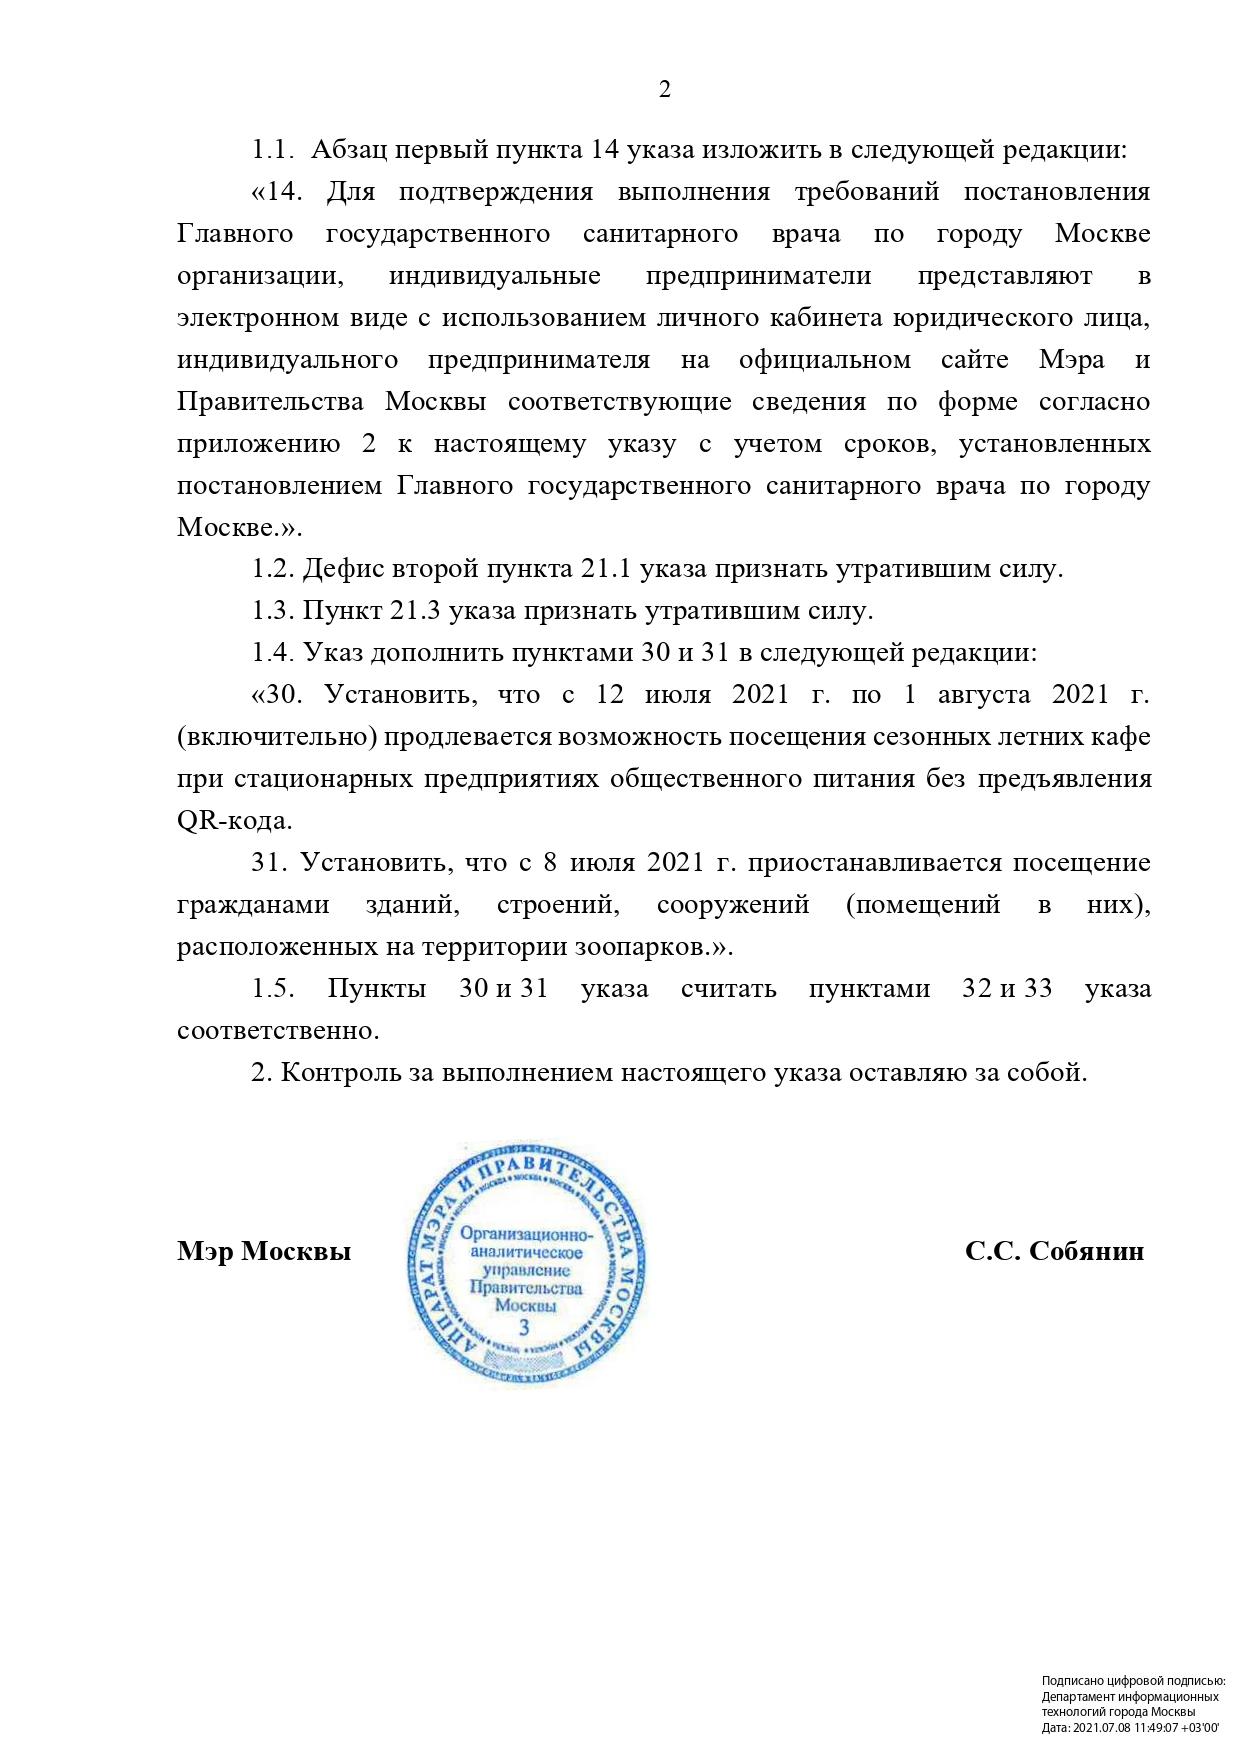 Указ Мэра Москвы Собянина С.С. от 8 июля 2021 г. (08.07.2021) No 40-УМ 2